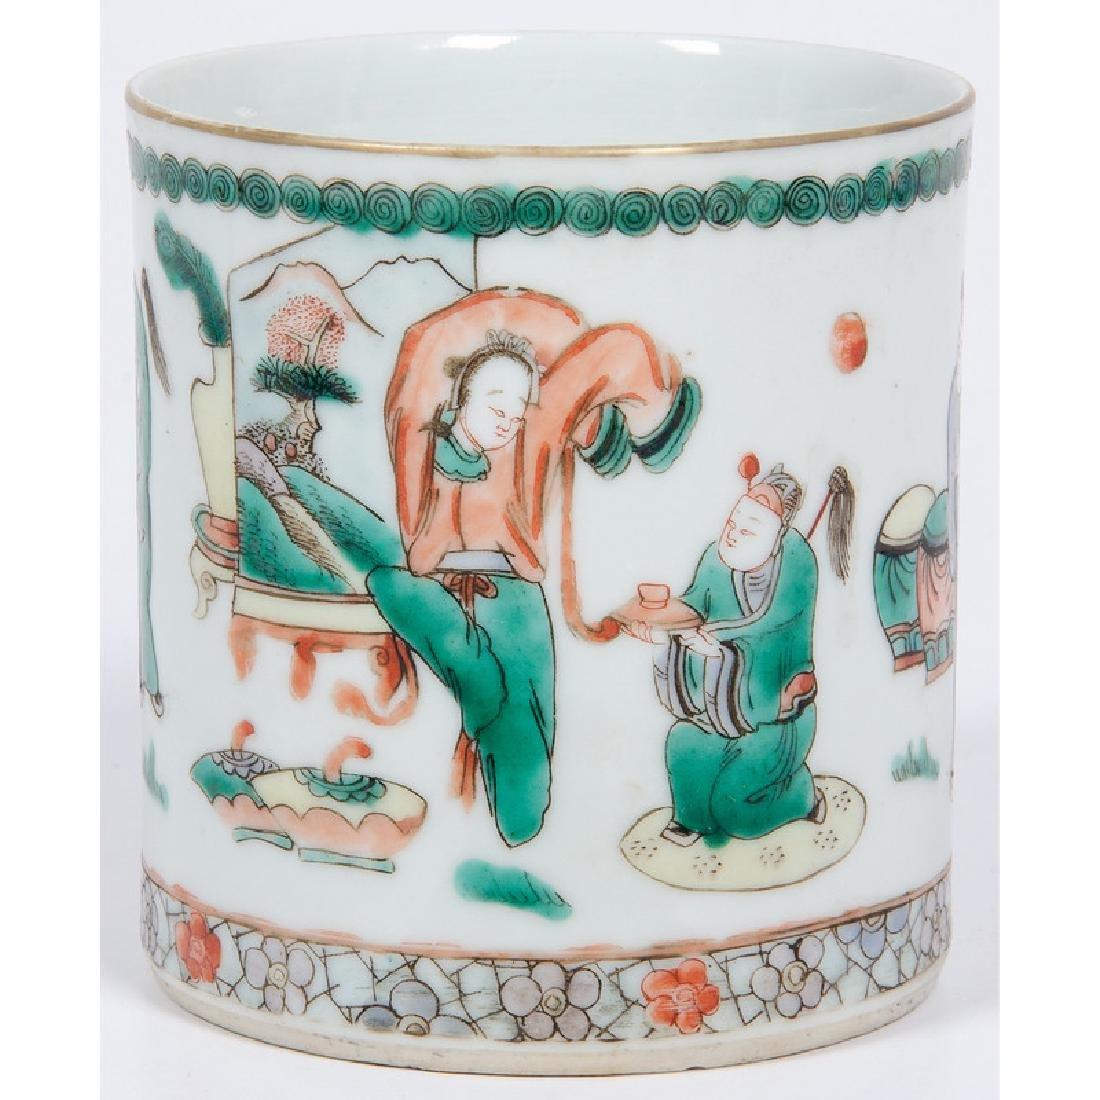 Chinese Export Mug and Plate - 2